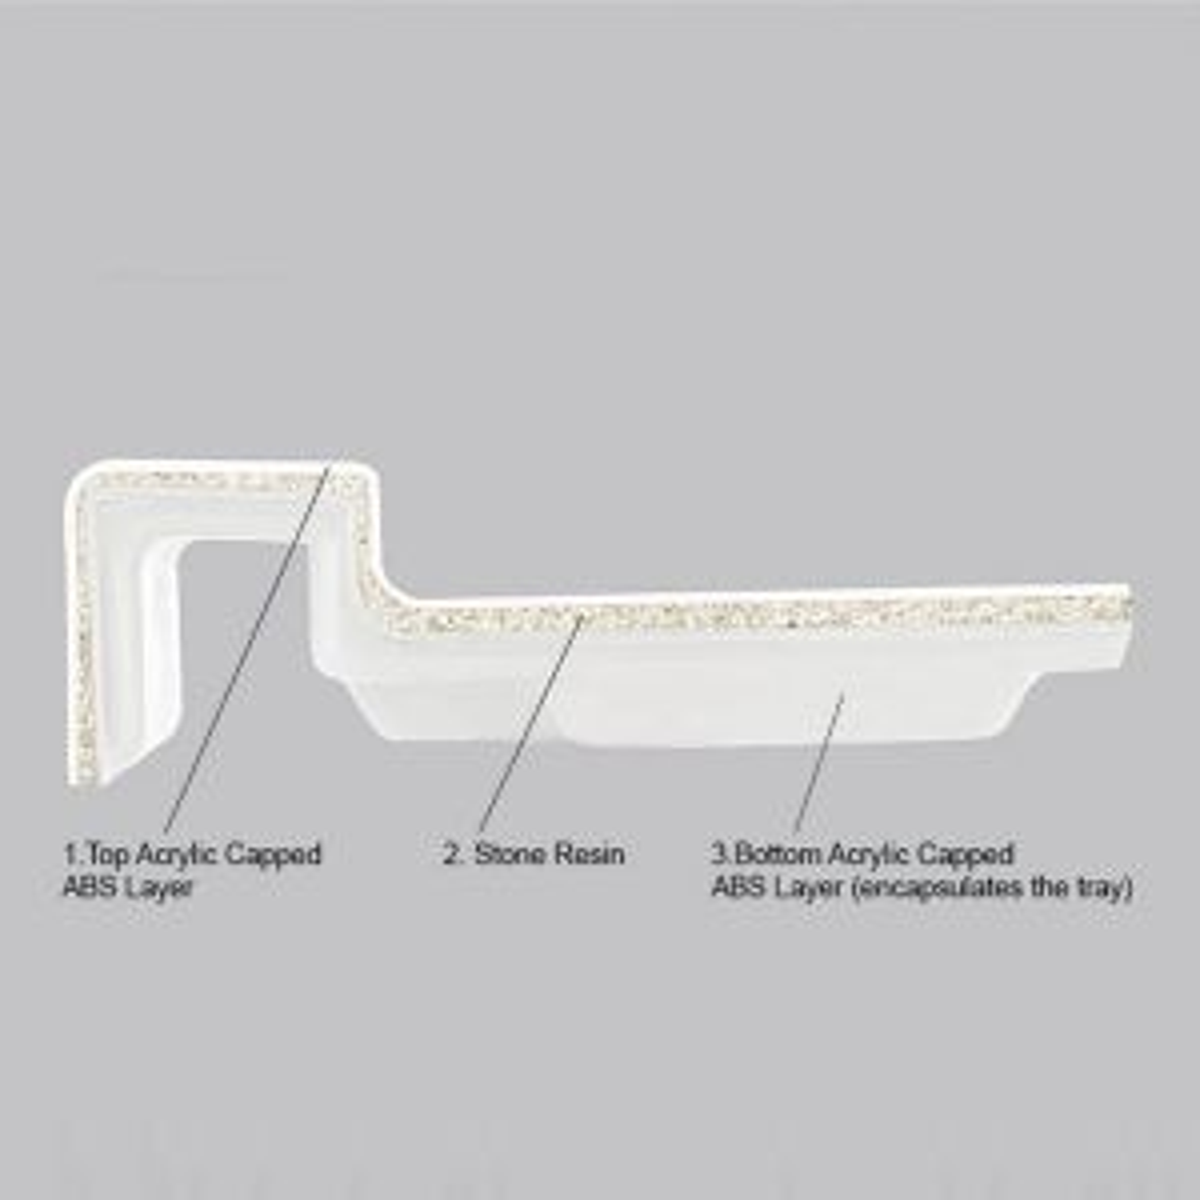 Merlyn MStone Offset Quadrant Shower Tray Left Hand 1000 x 800mm